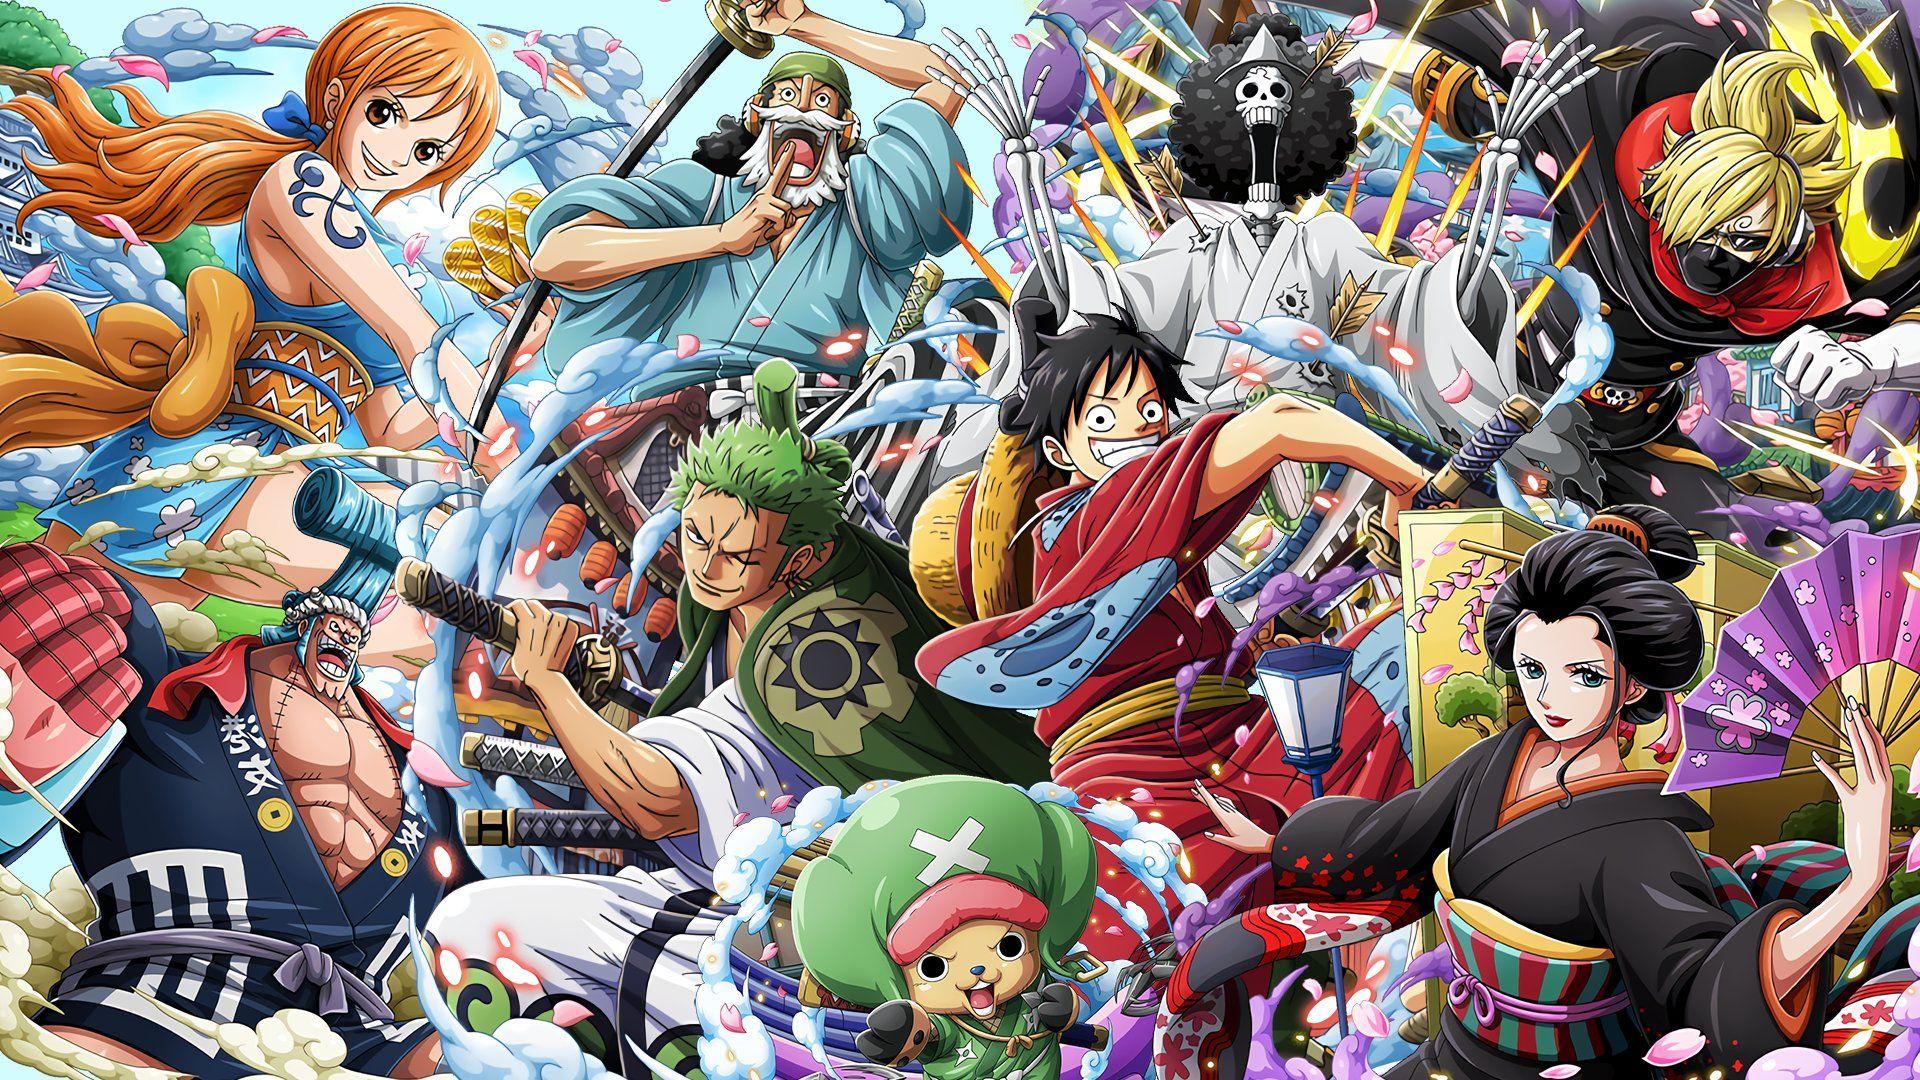 1920x1080 Luffy Minimalist Tek Parca Duvar Kagidi 21947 In 2021 Manga Anime One Piece One Piece Wallpaper Iphone Luffy Wallpaper